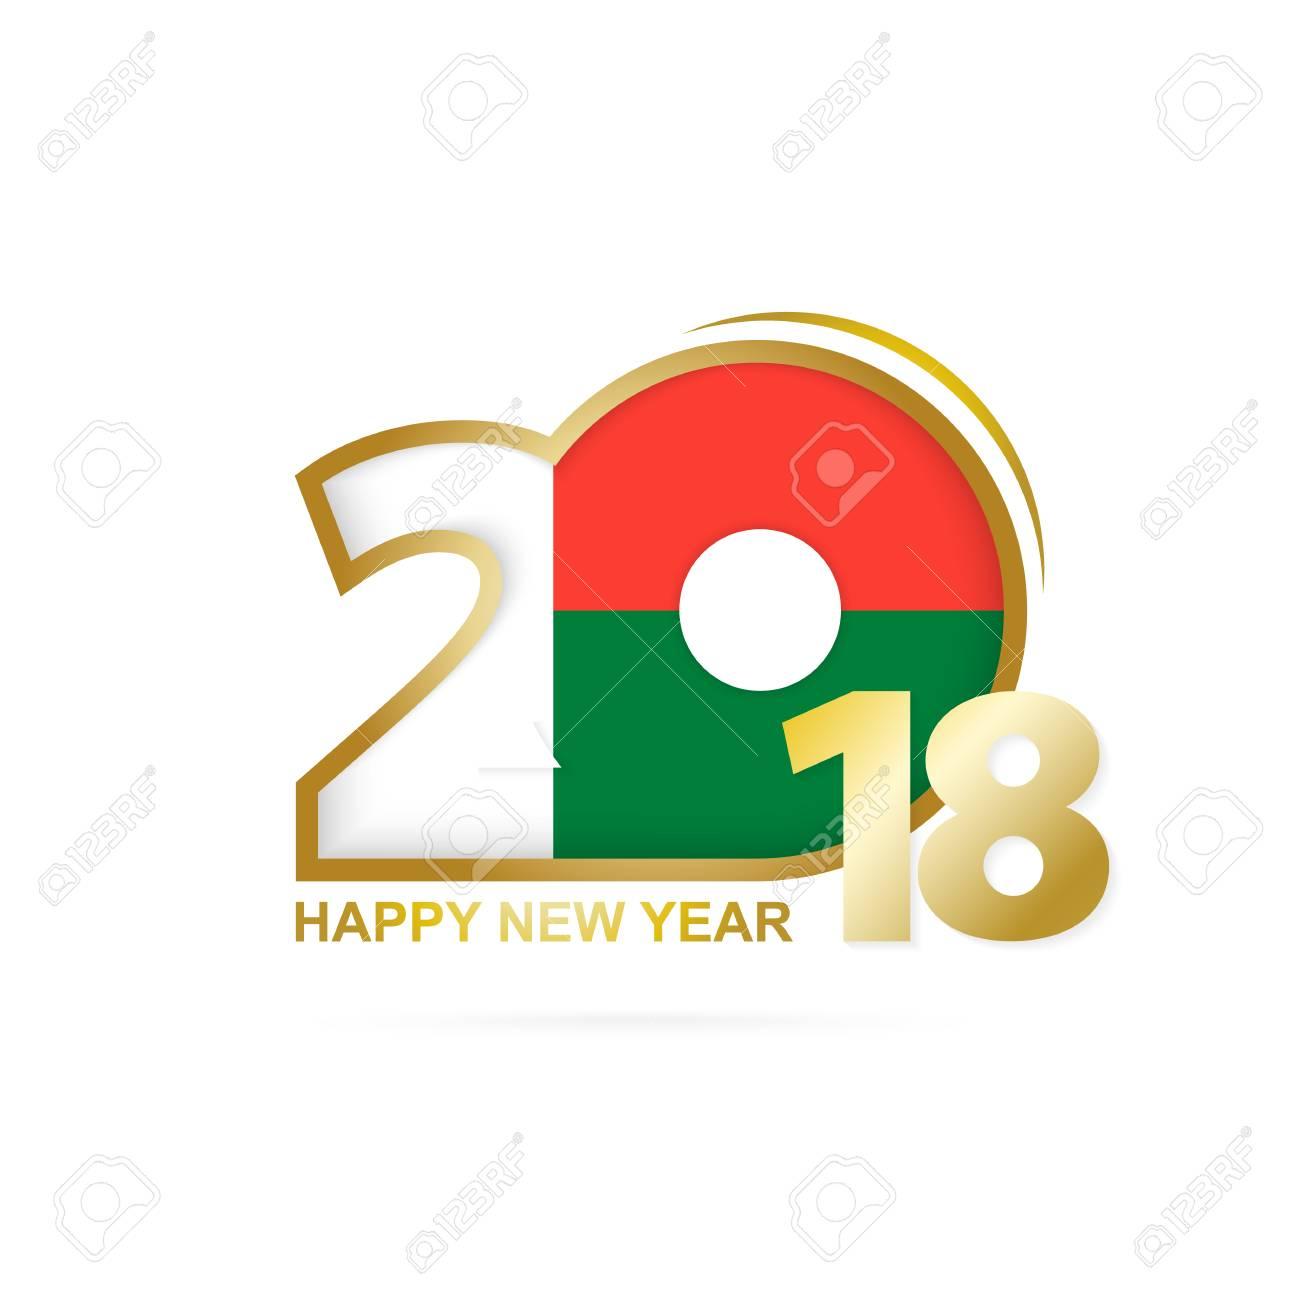 Year 2018 with Madagascar flag design. - 87571153